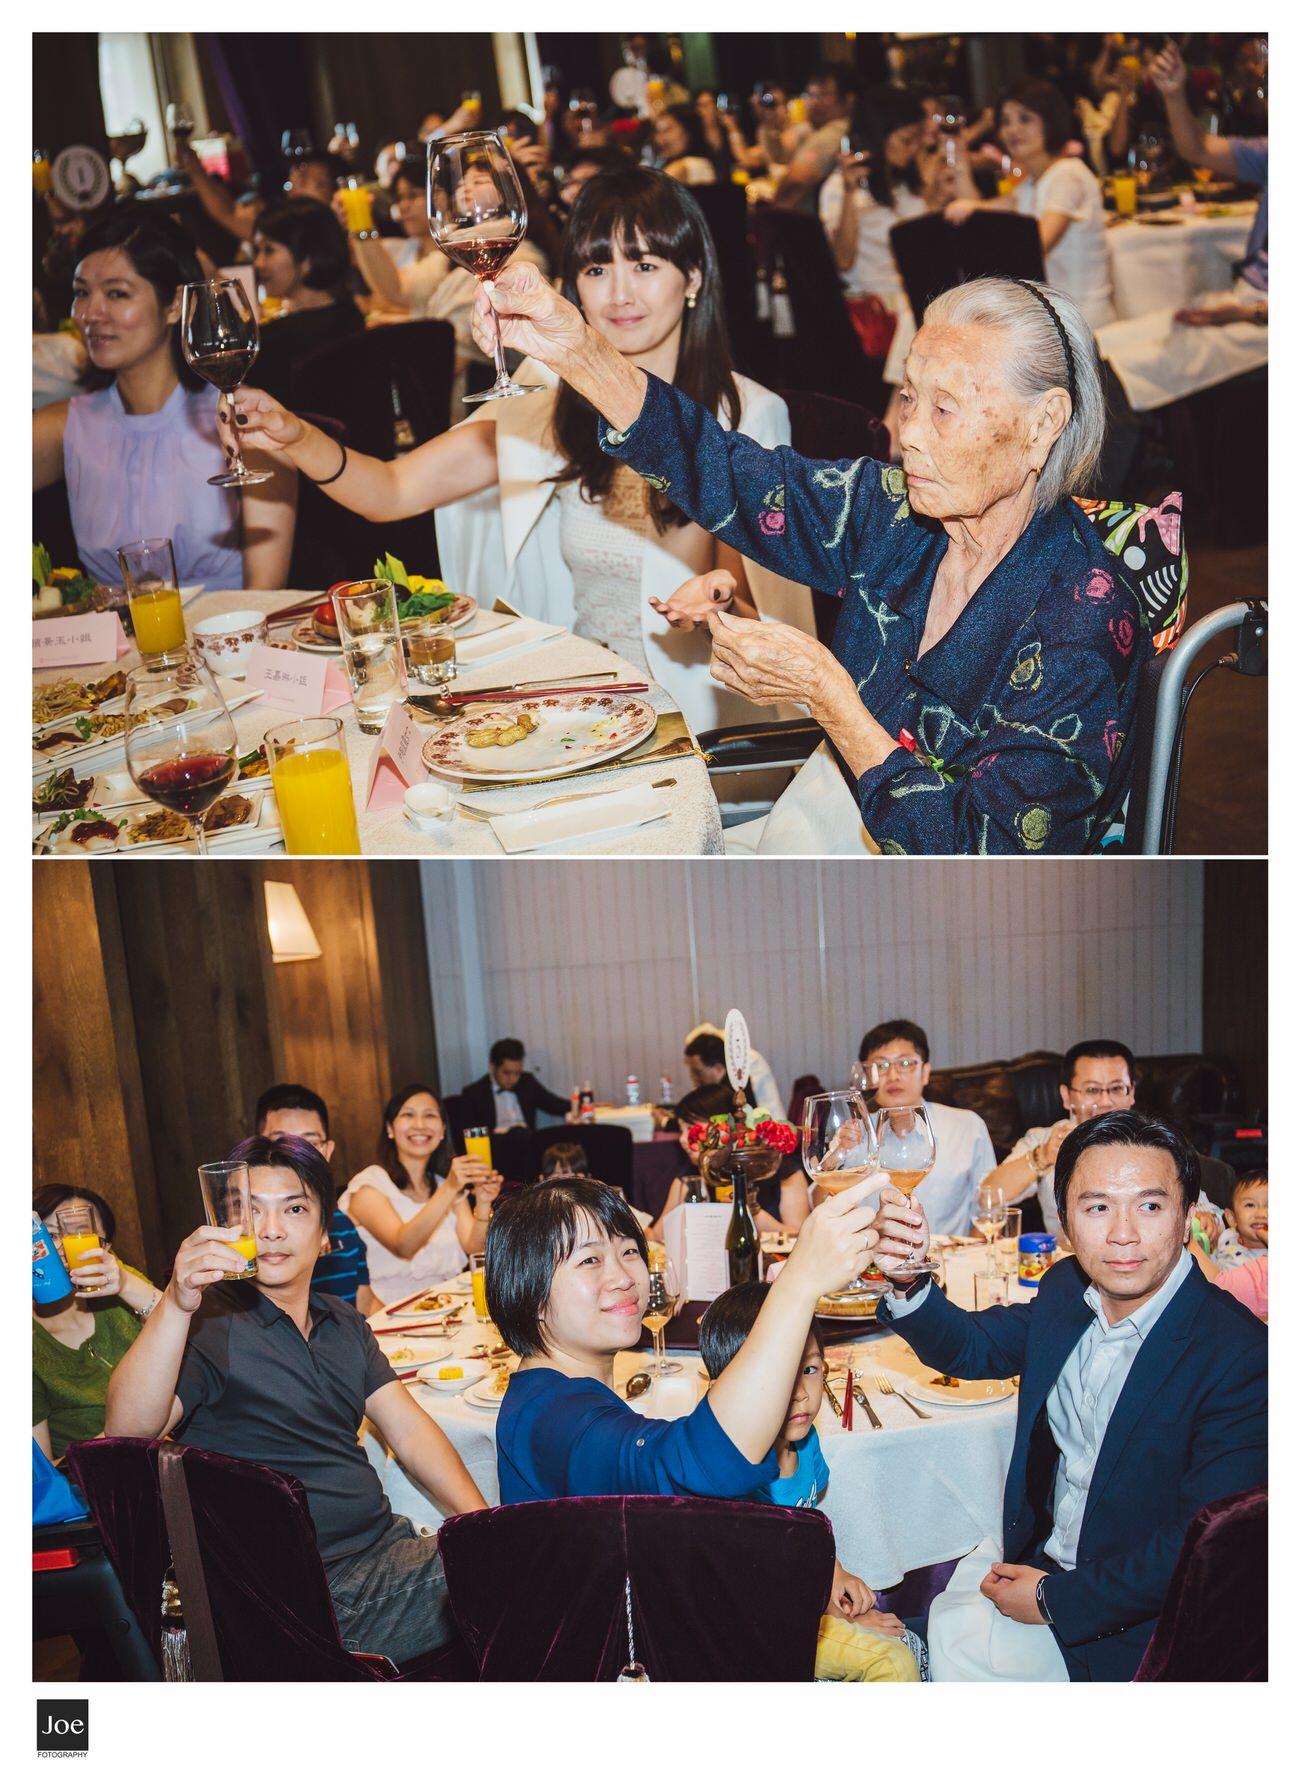 joe-fotography-wedding-photo-palais-de-chine-hotel-028.jpg